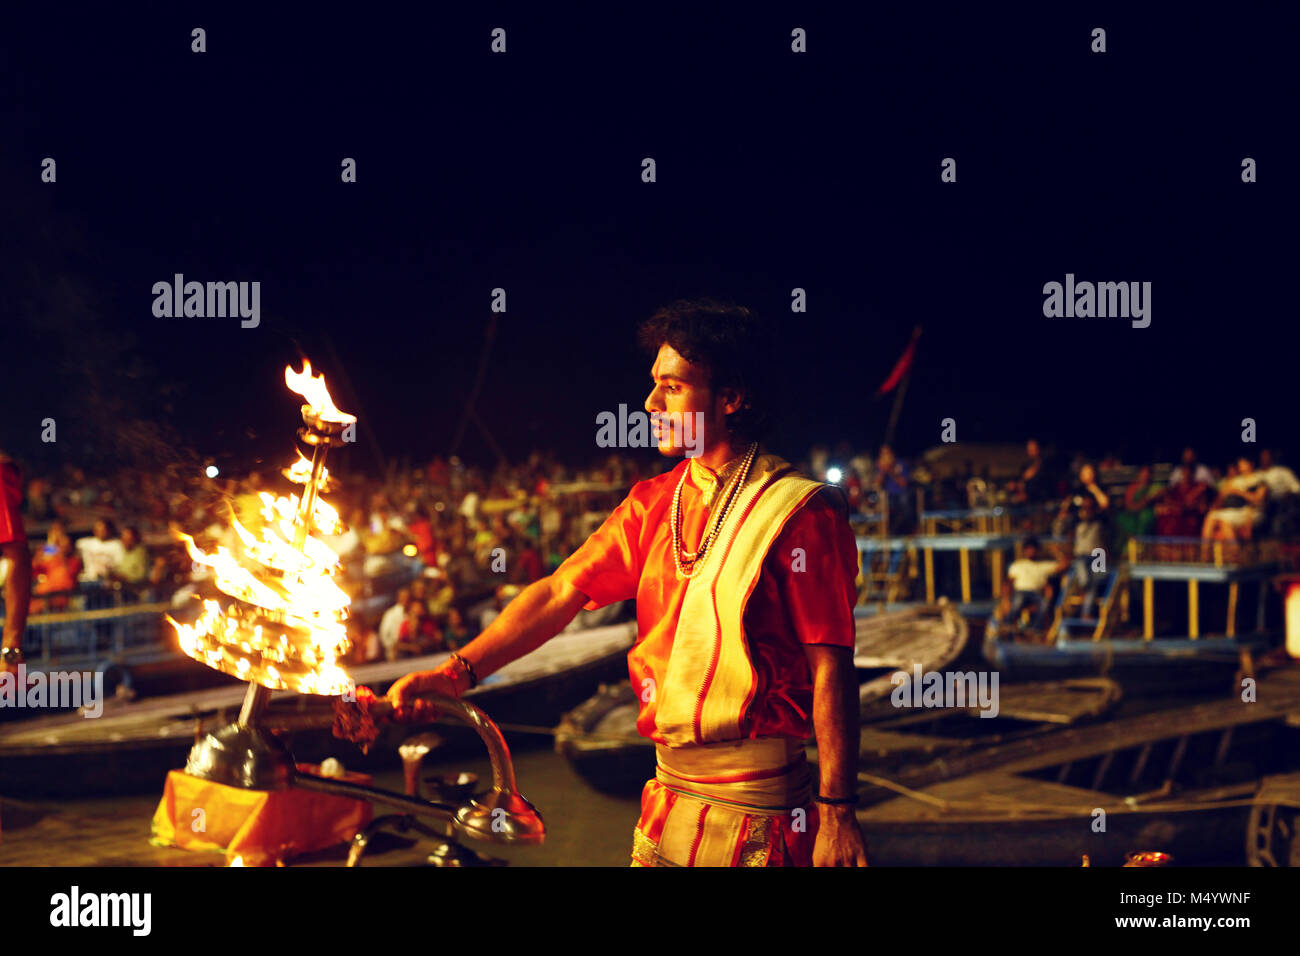 Ganga Aarti ceremony held on edge of Ganges River, Varanasi, Uttar Pradesh, India - Stock Image